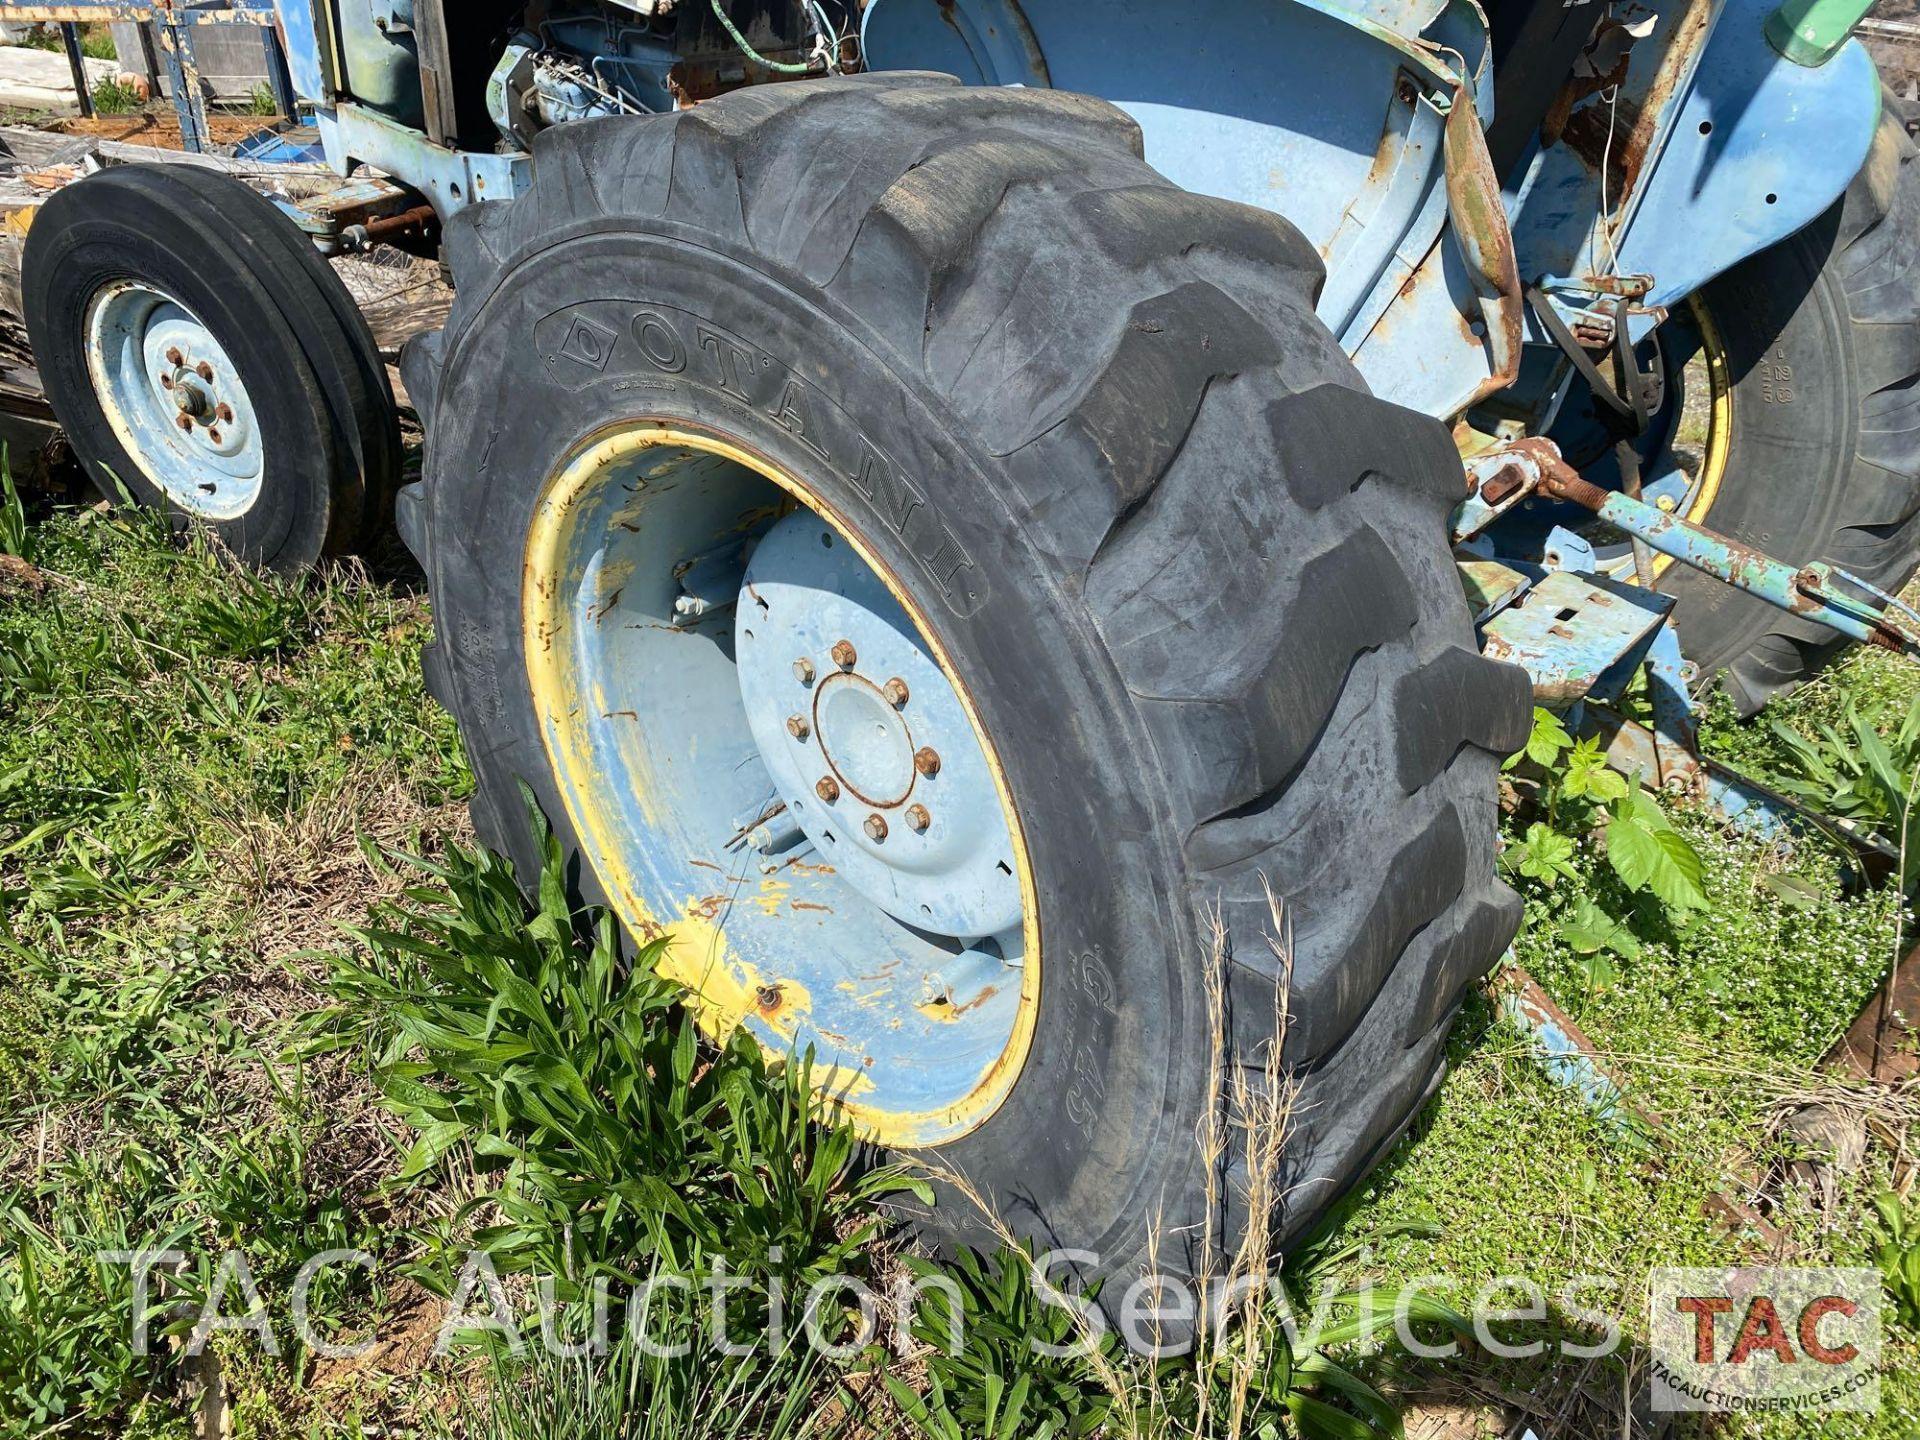 John Deere 2150 Farm Tractor - Image 29 of 34